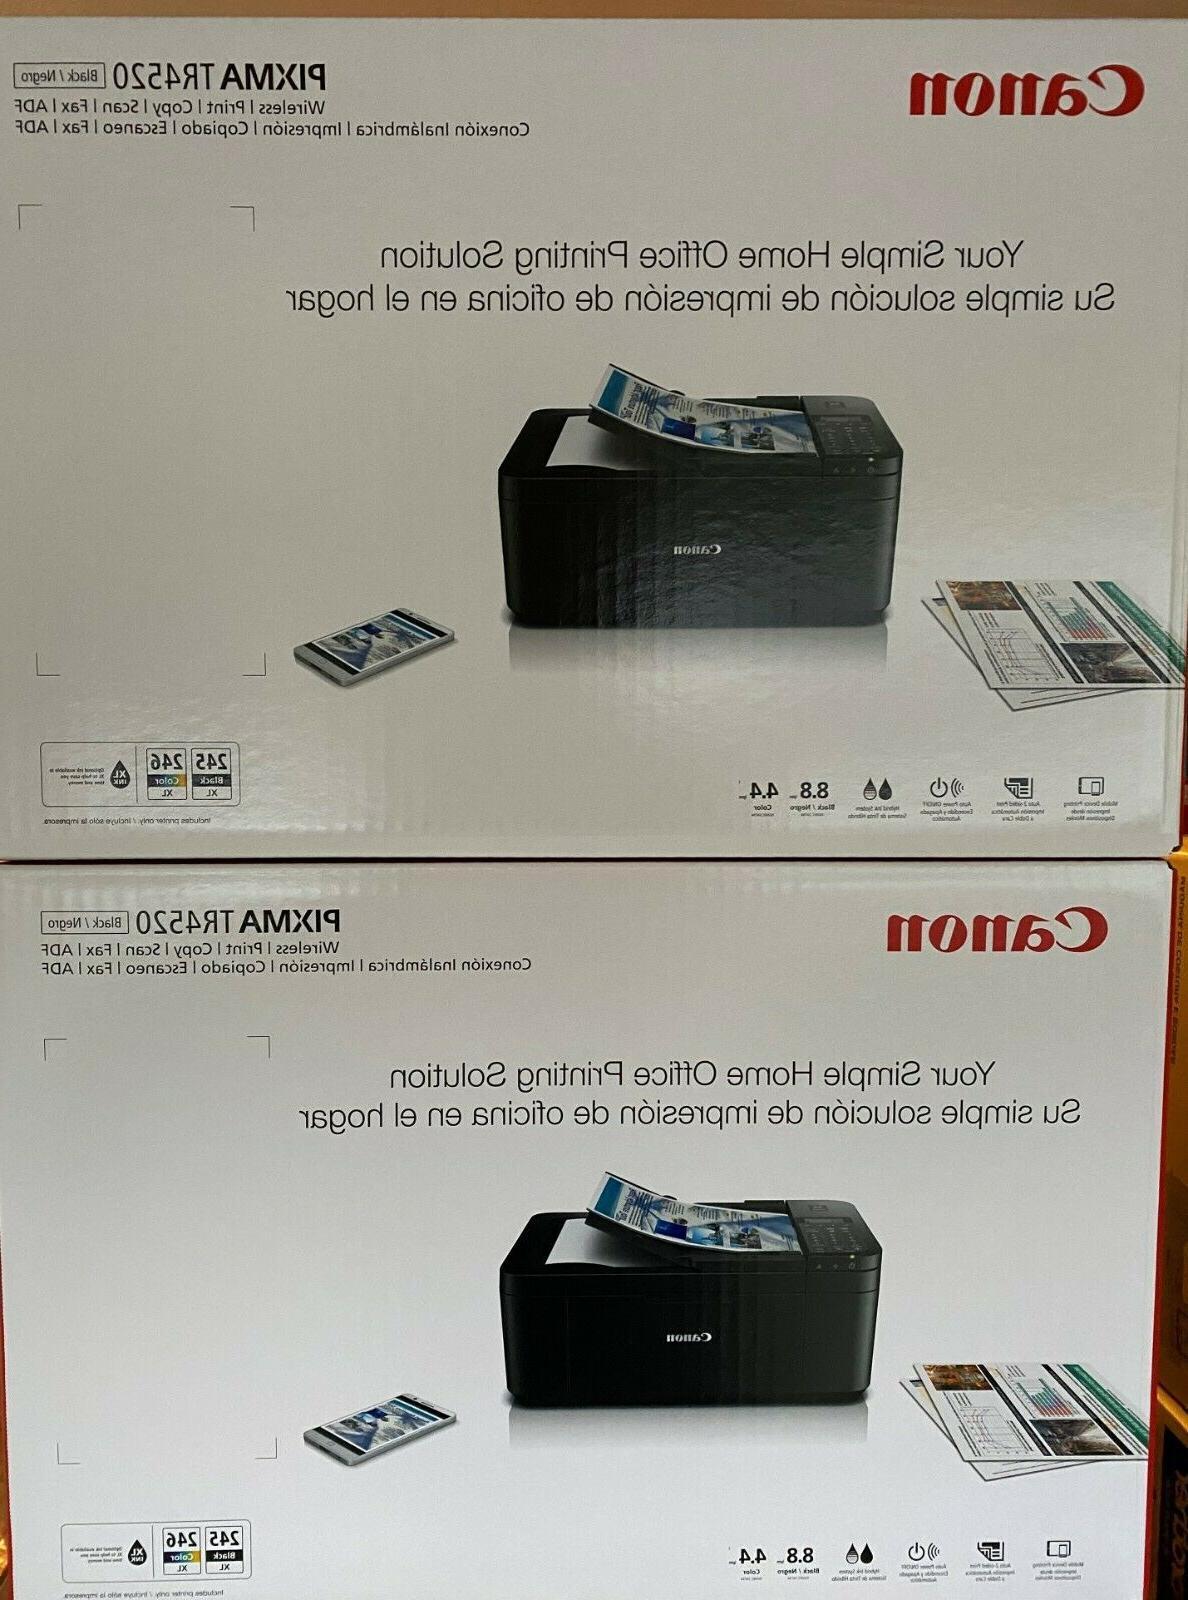 Canon TR4520 Wireless Inkjet Printer 🚚FREE SAME DAY